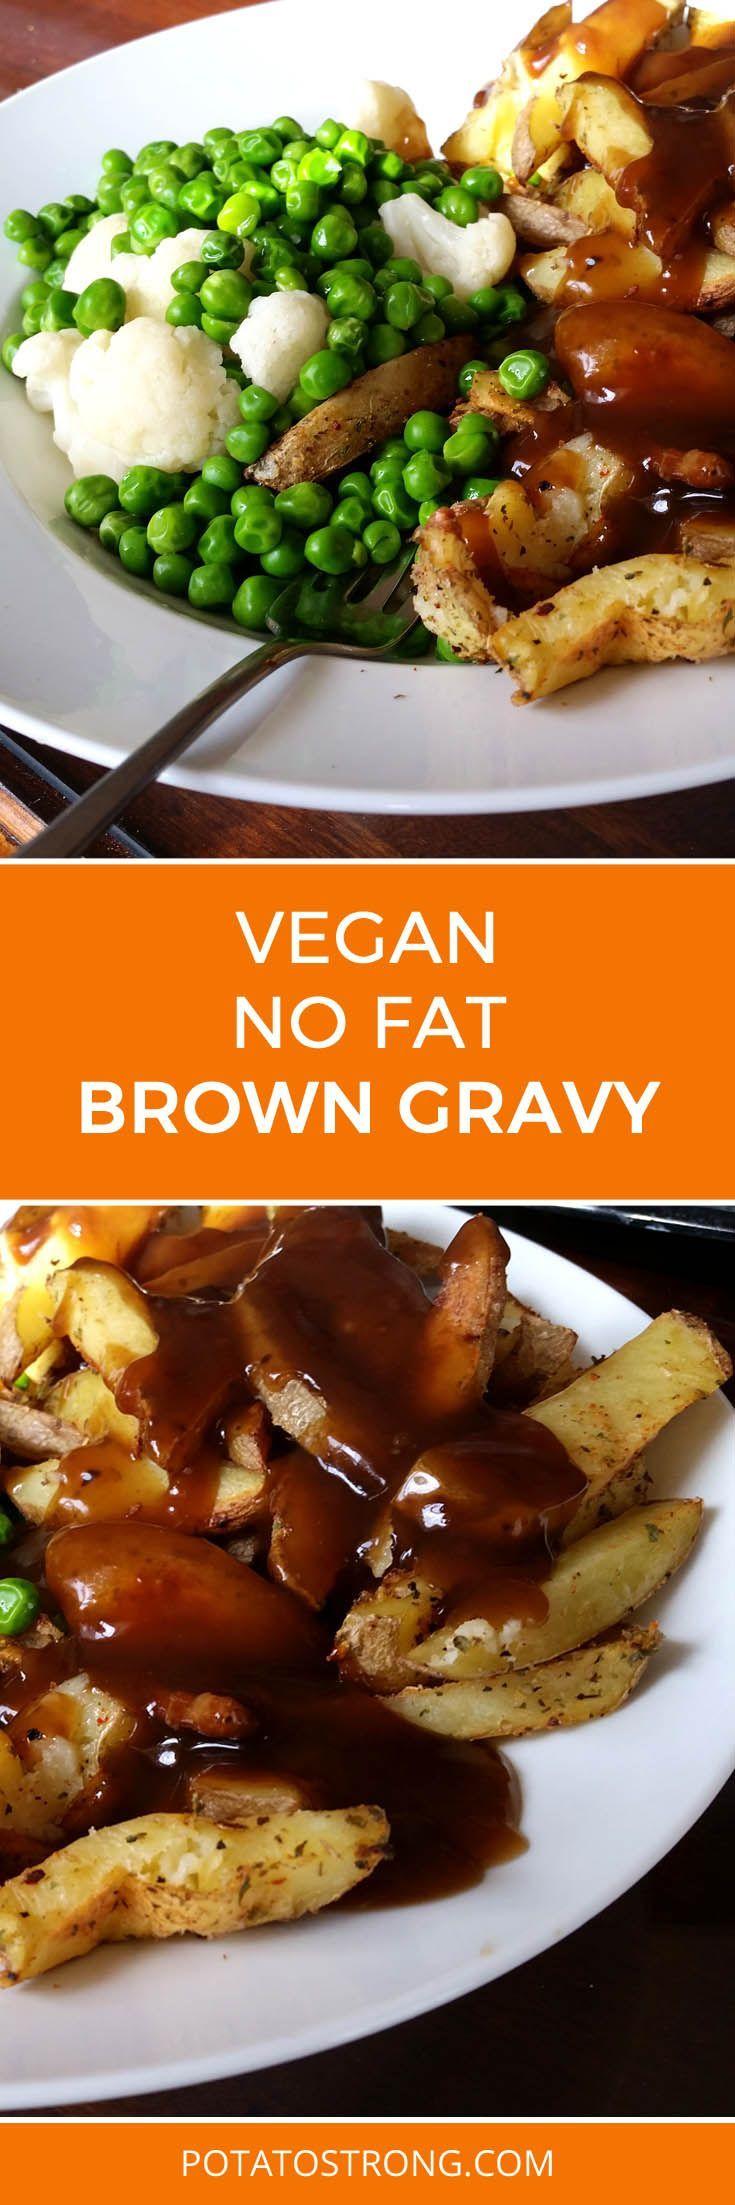 Vegan brown gravy no oil